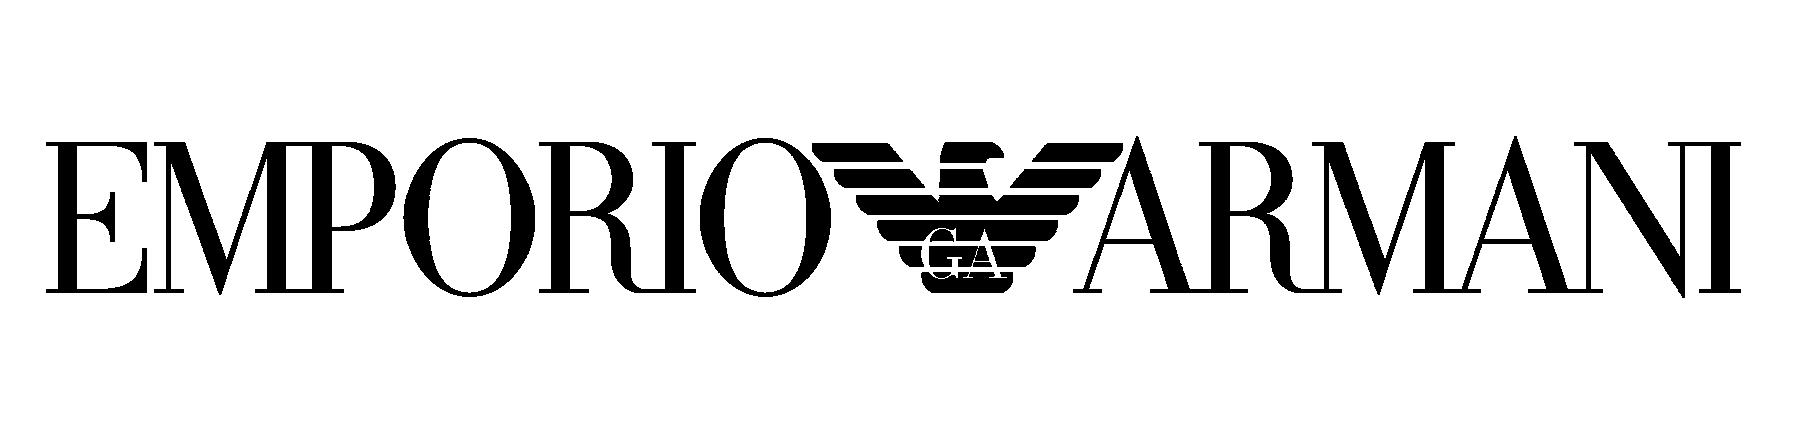 emporio-armani-logo_1